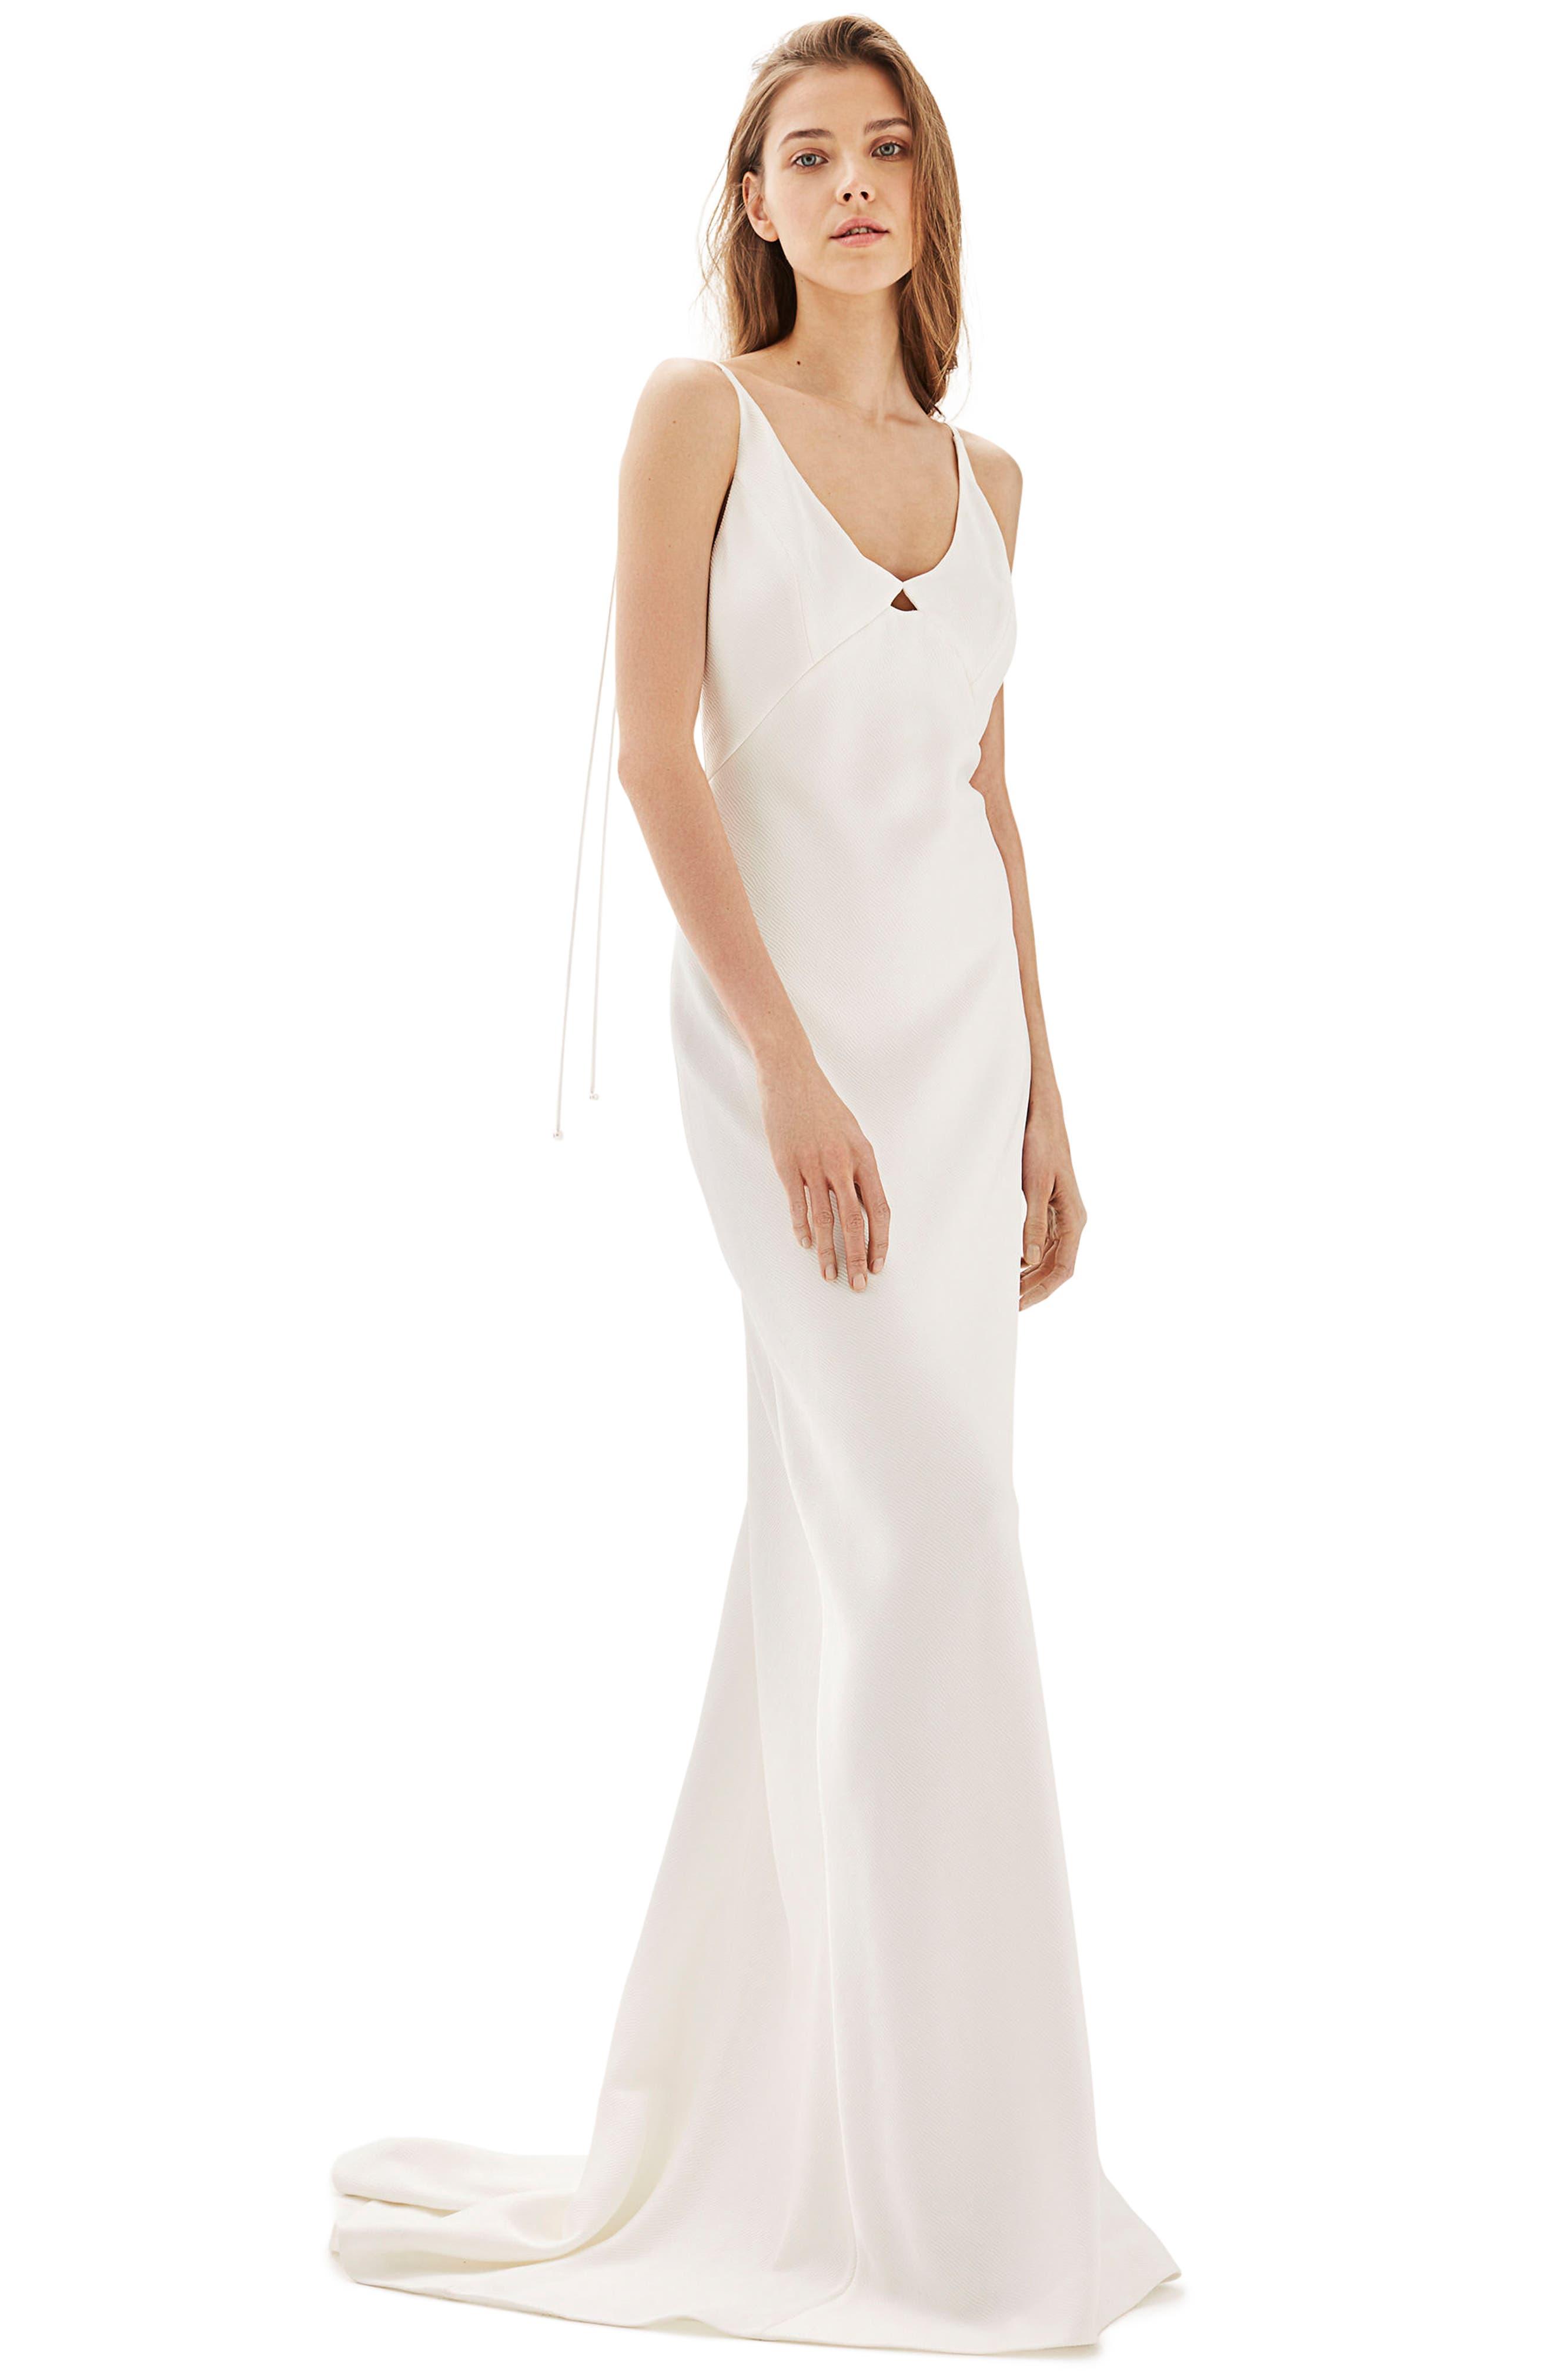 Bride V-Neck Satin Sheath Gown,                             Main thumbnail 1, color,                             900